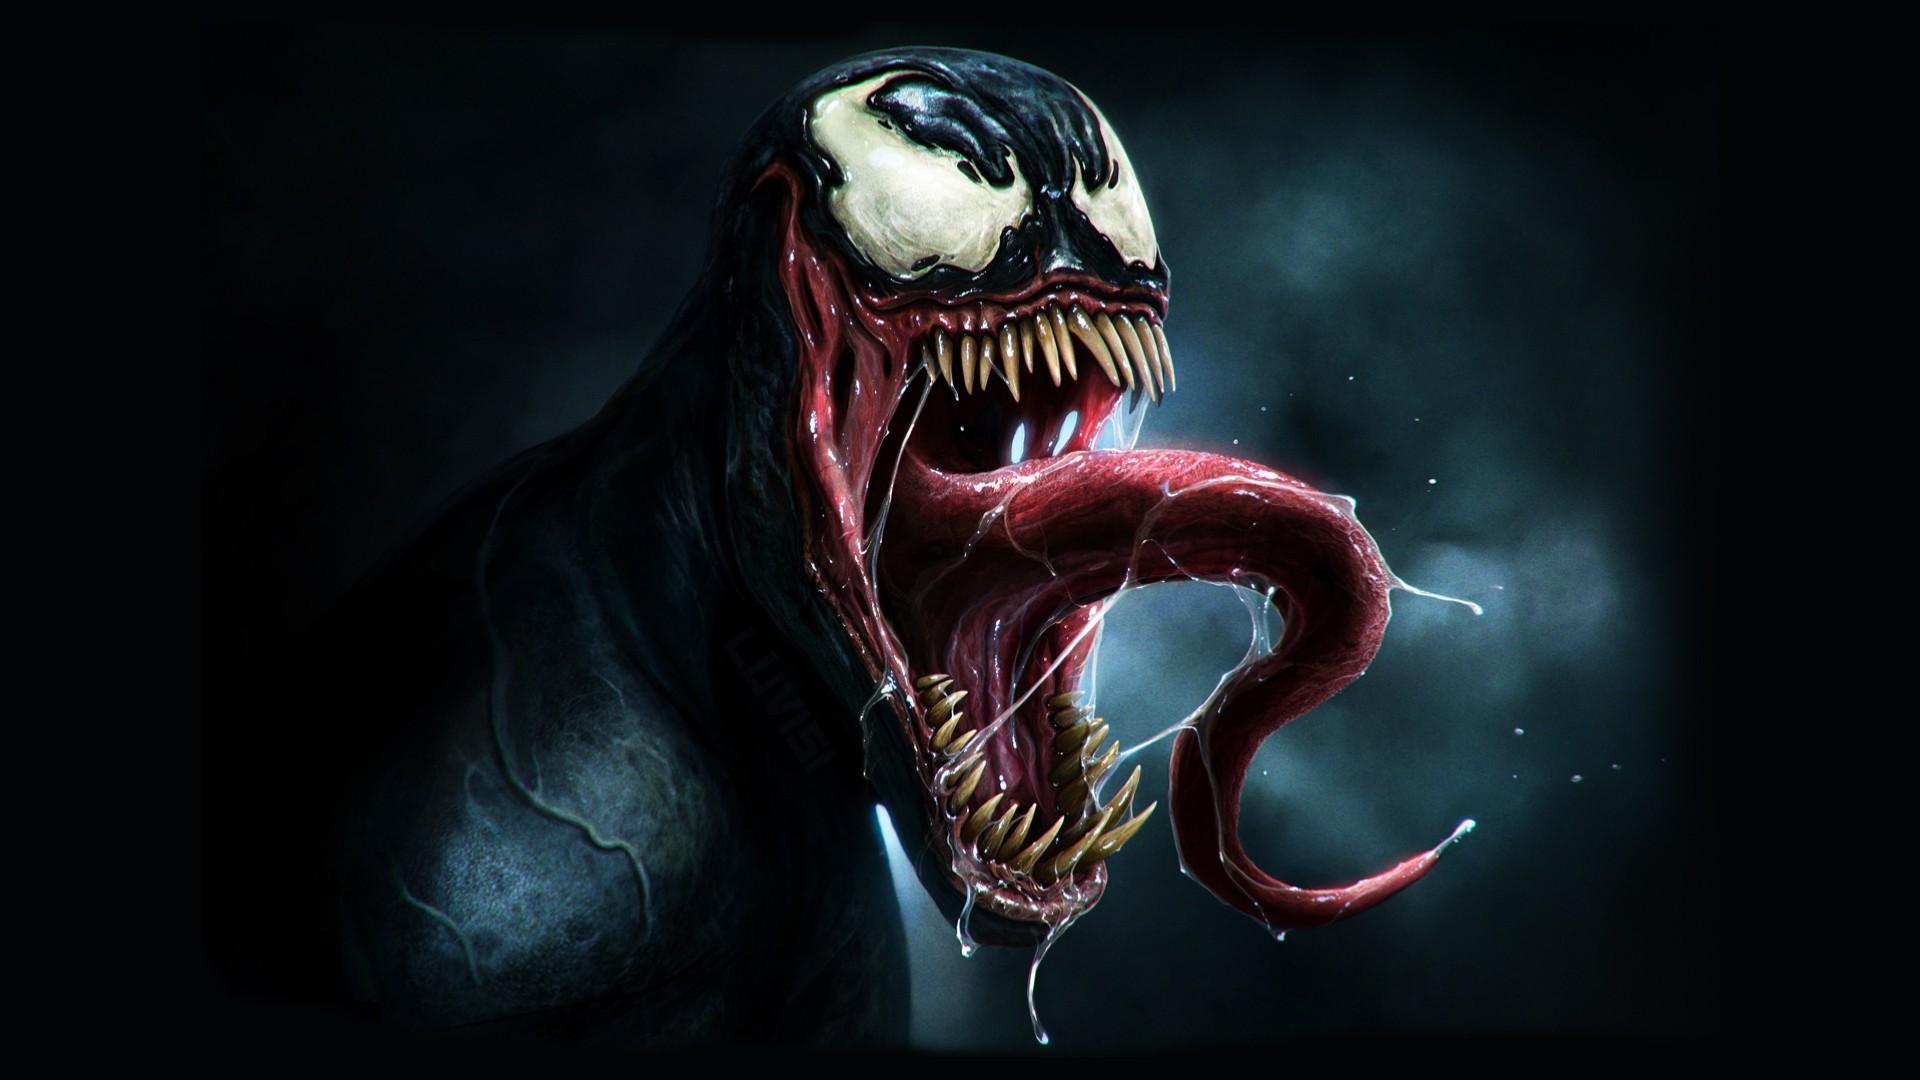 Smile Fangs Marvel comics comics Venom wallpapers and images 1920x1080